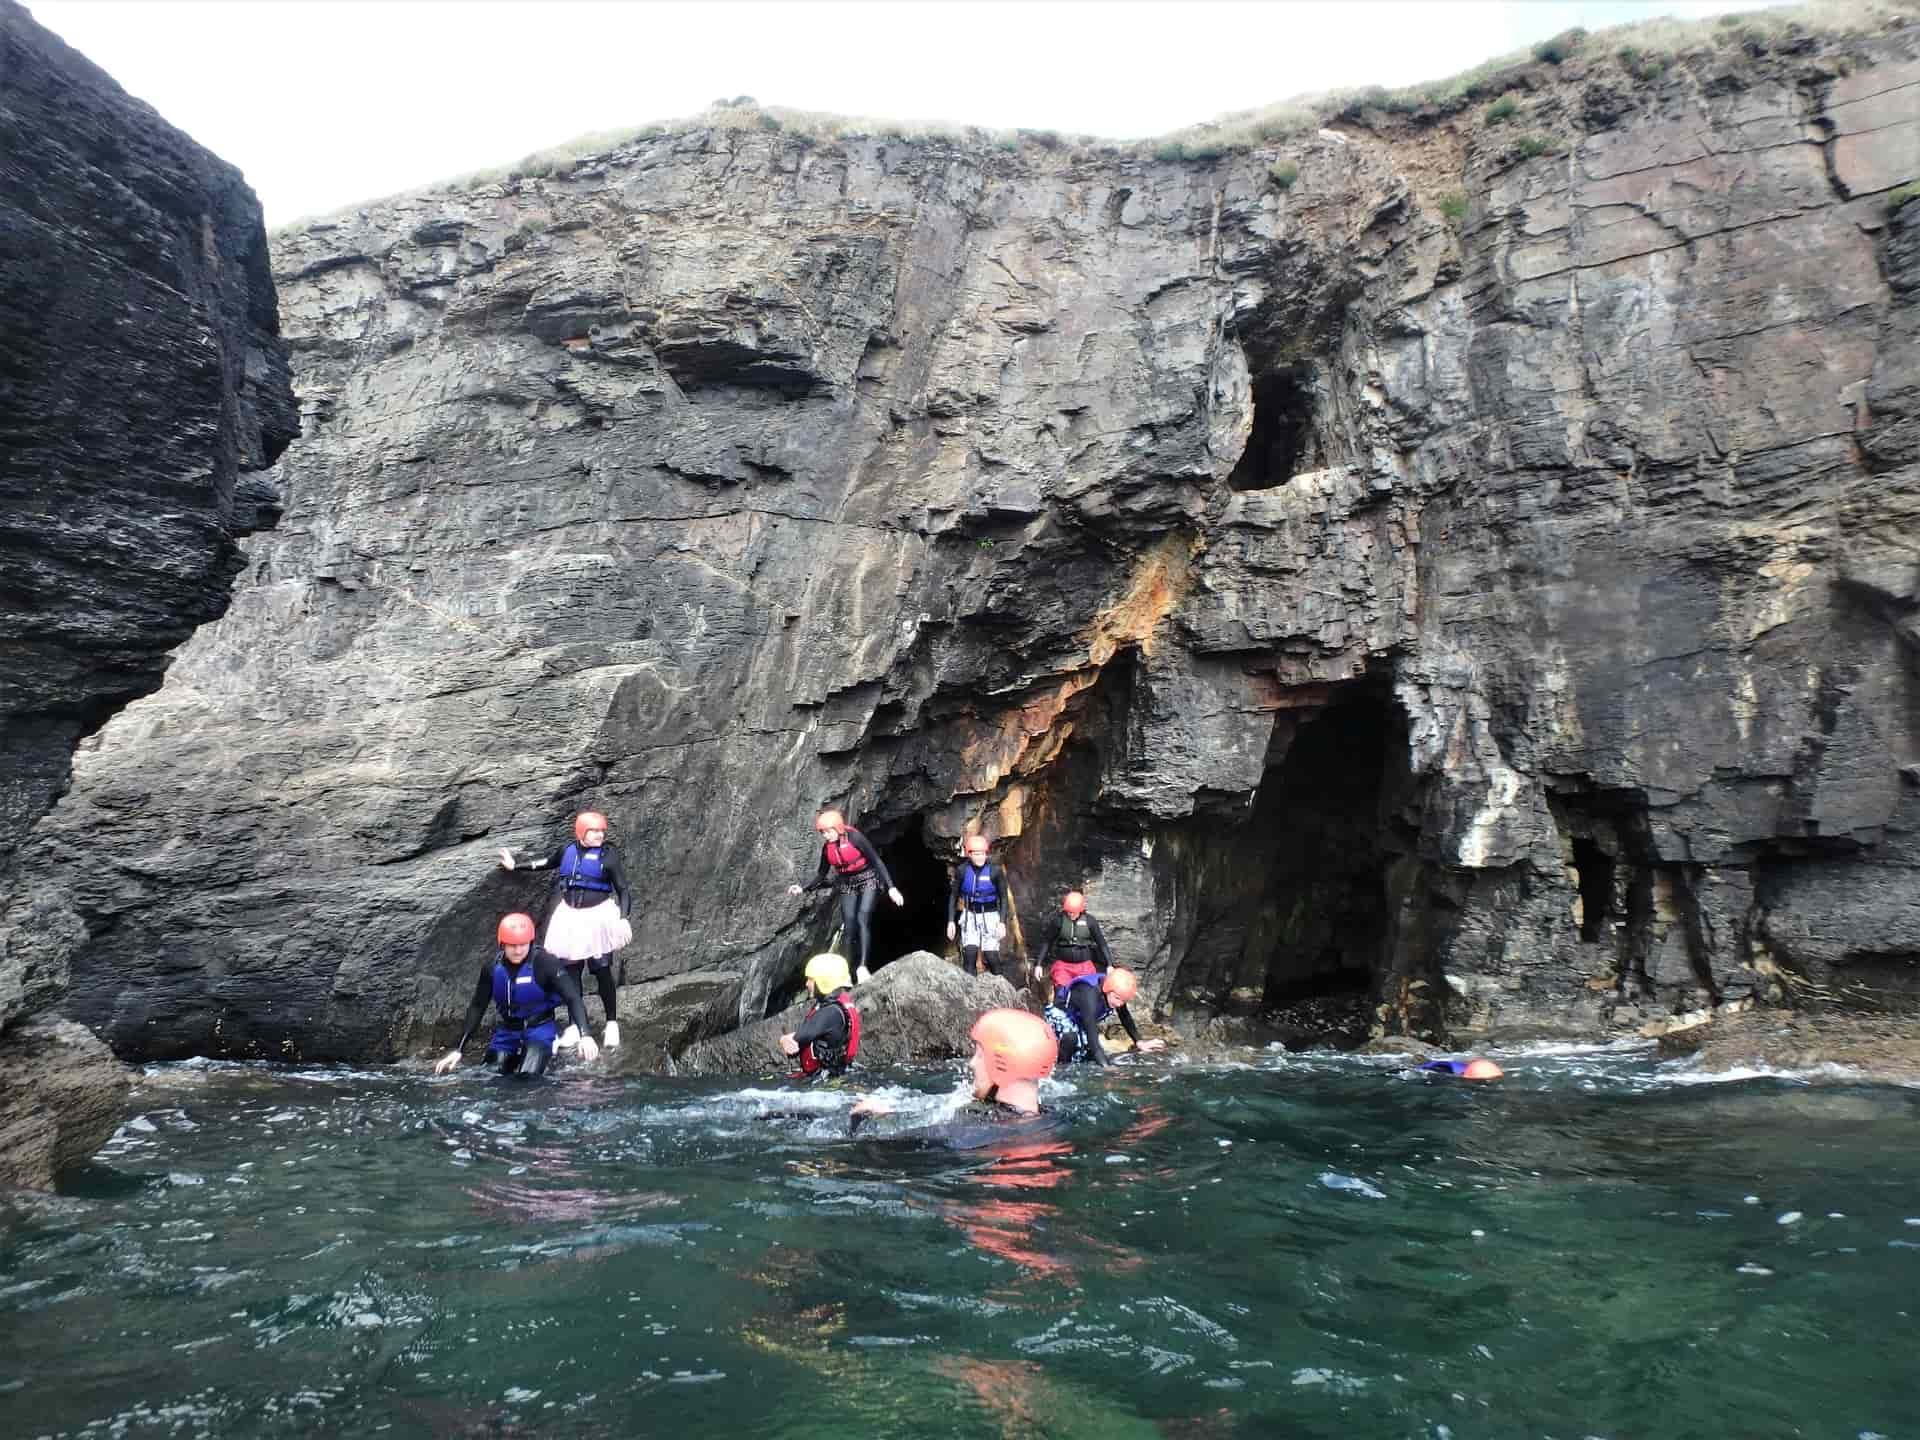 Coasteering at Praa Sands under an old Cornish mine. Coasteering with Cornish history with Kernow Coasteering